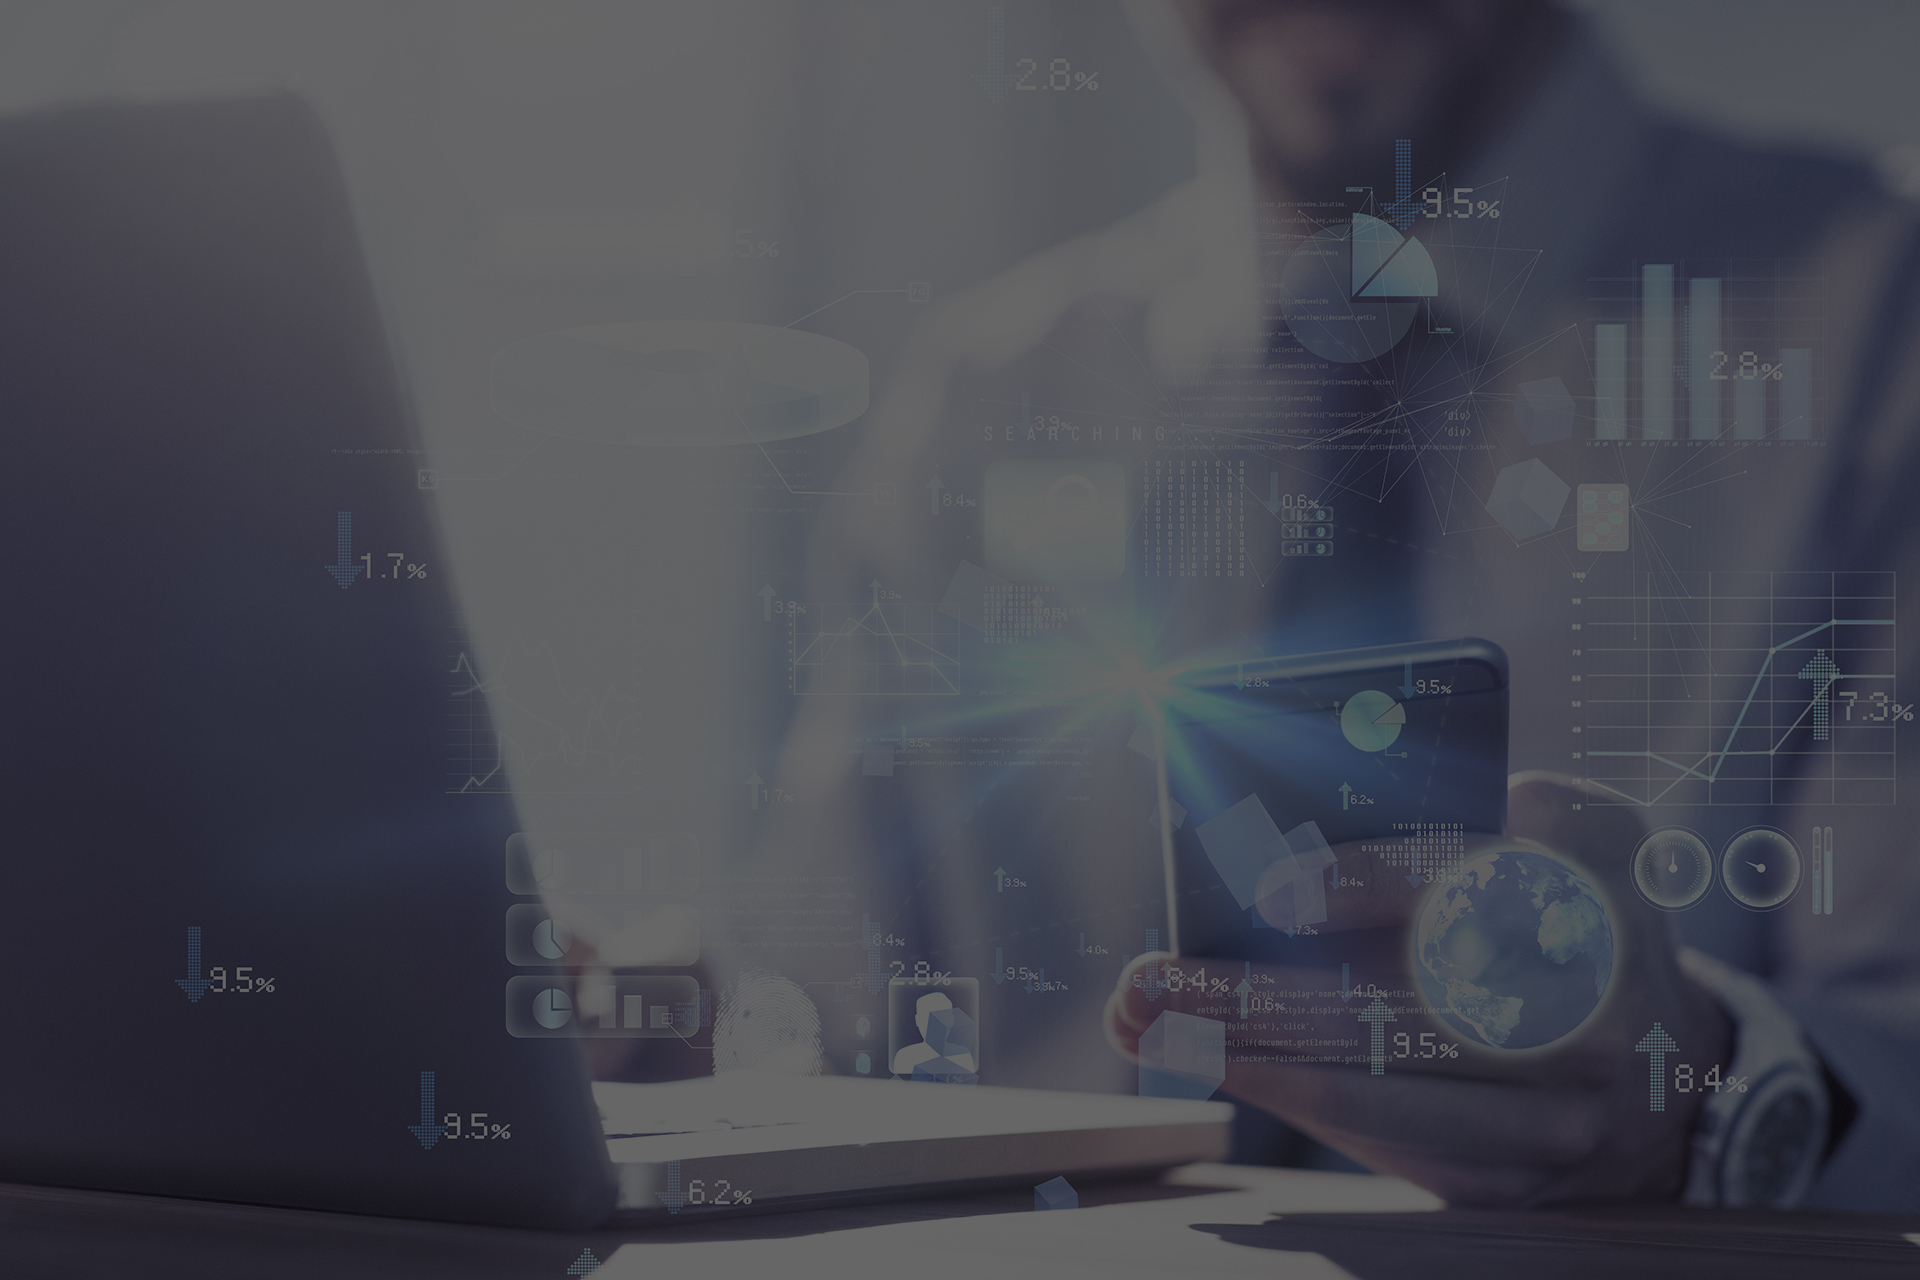 Global technology background against businessman using laptop at desk